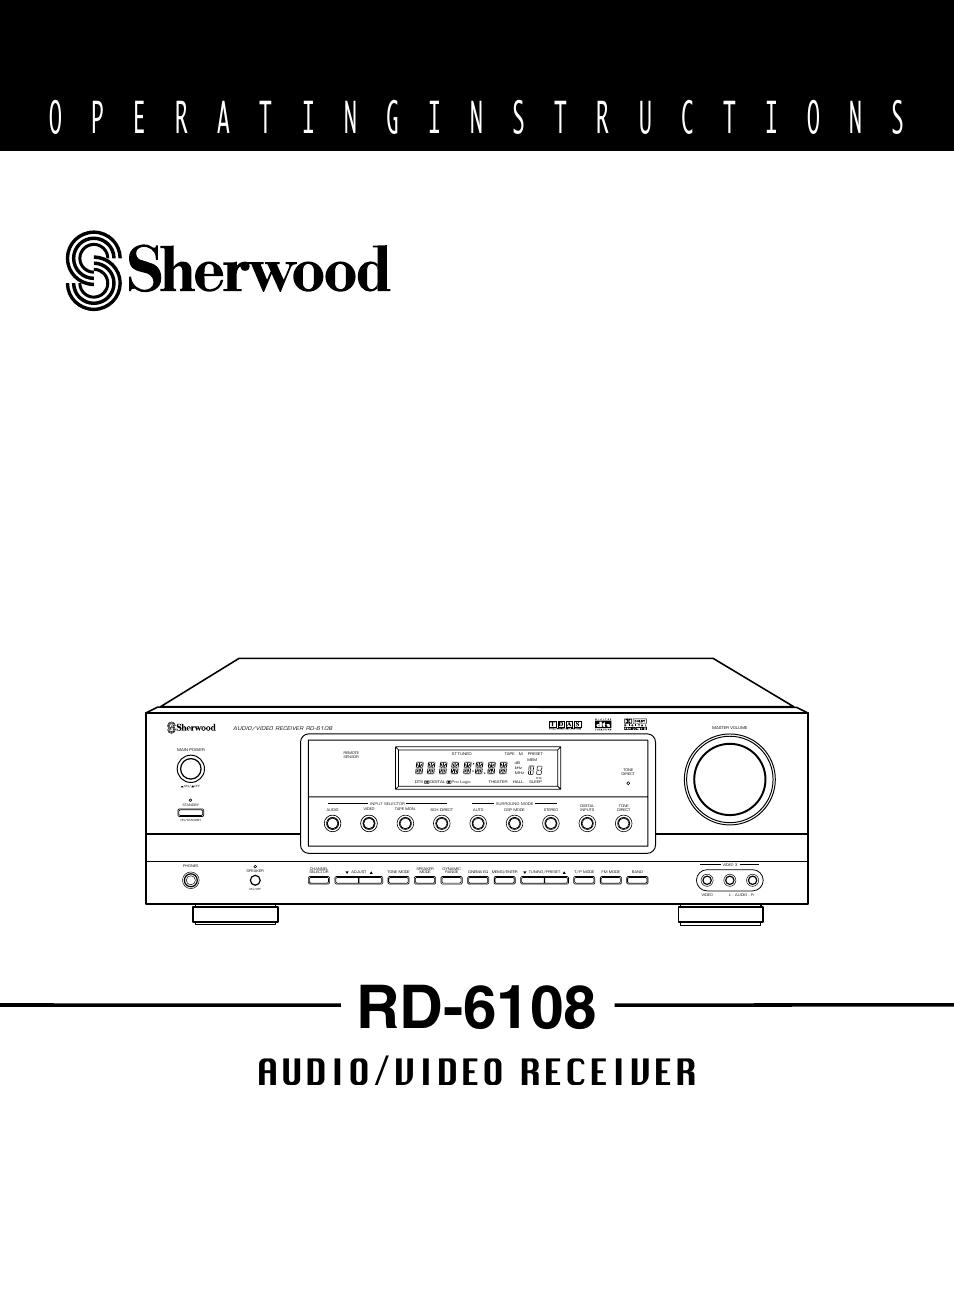 sherwood rd 6108 user manual 25 pages rh manualsdir com